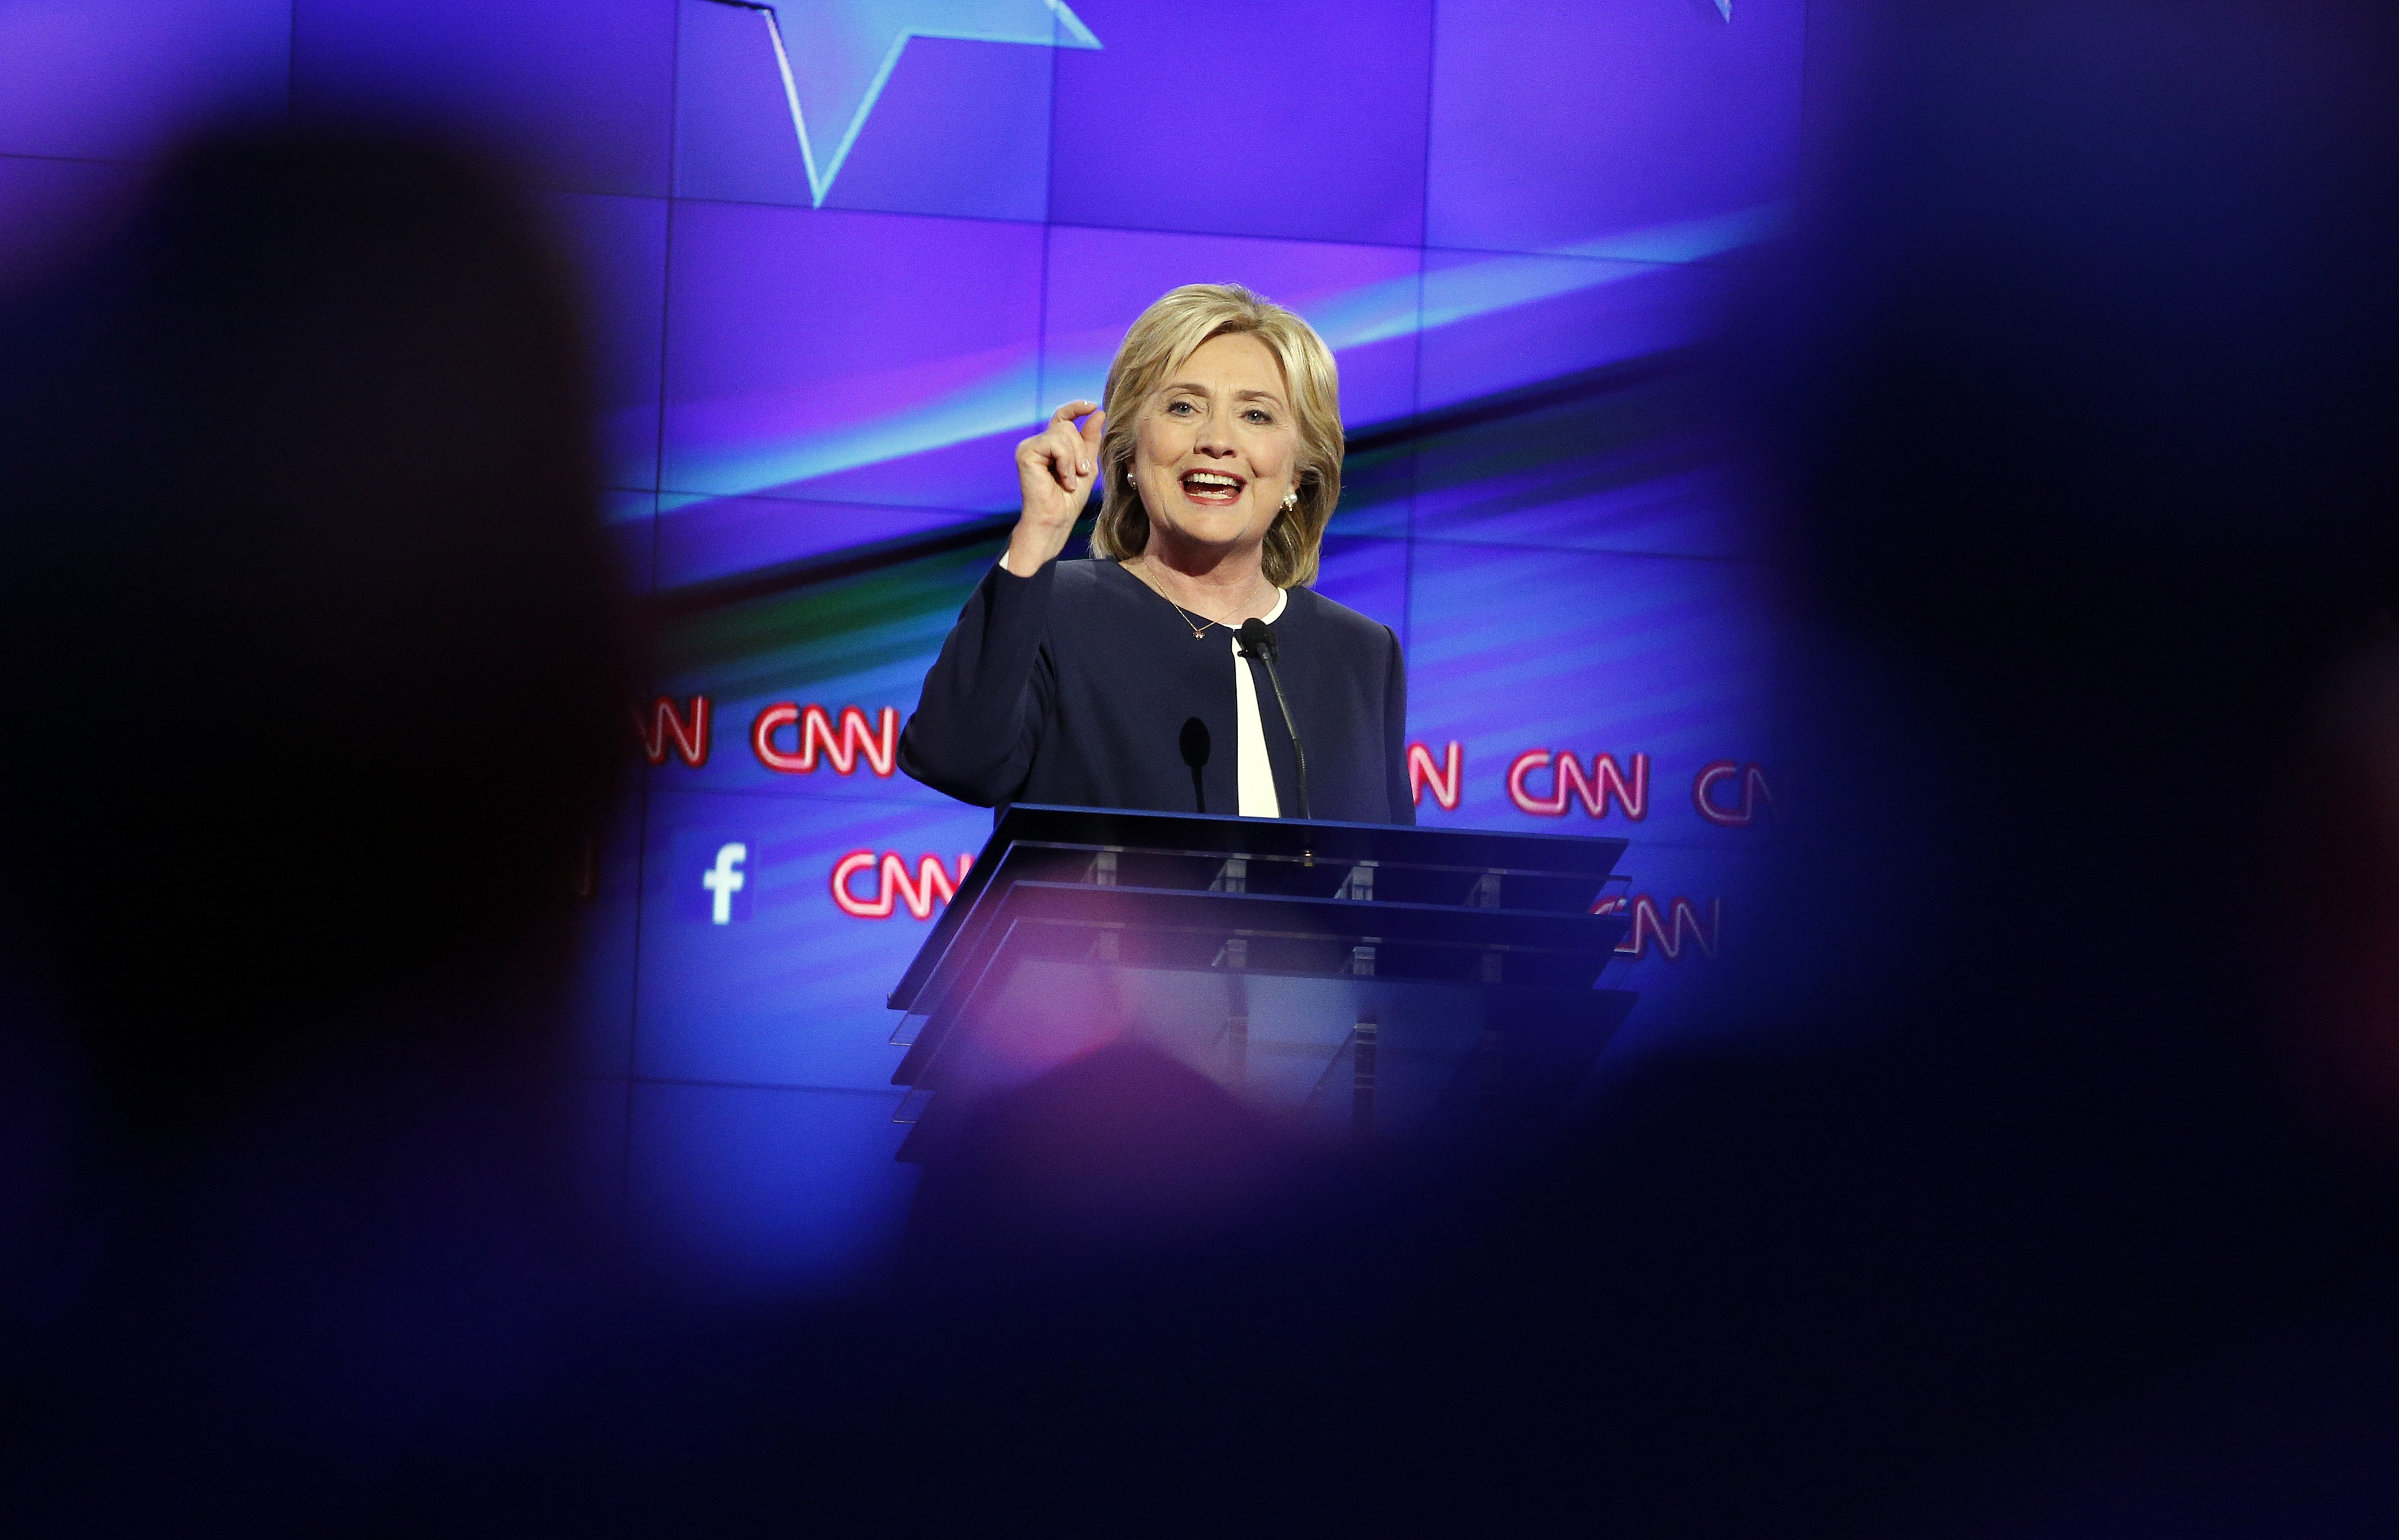 Hillary Rodham Clinton speaks during the CNN Democratic presidential debate, on Oct. 13, 2015, in Las Vegas.